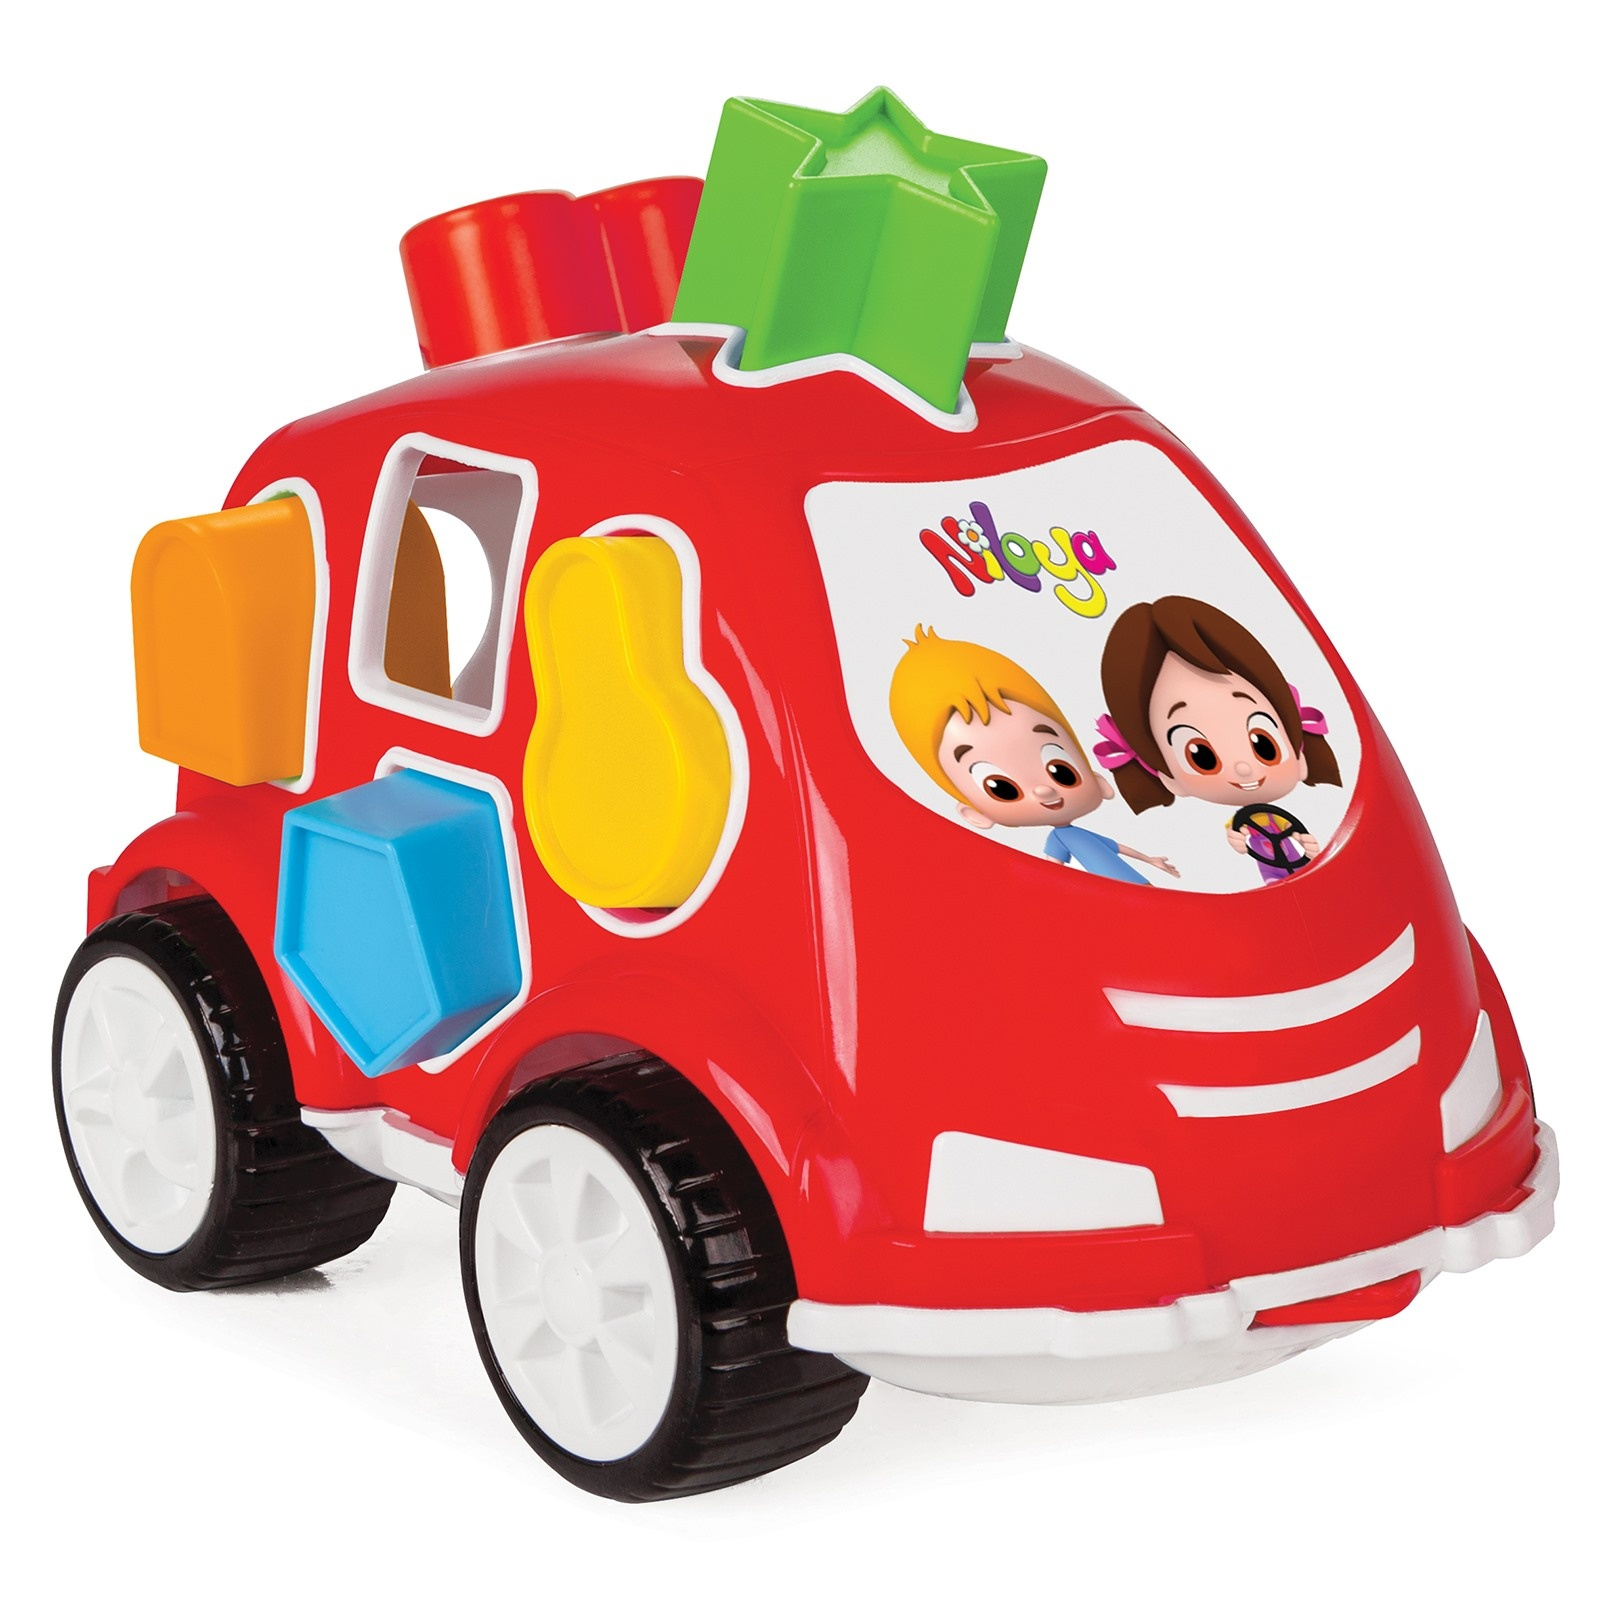 Ebebek Niloya Educational Shape Sorter Car Toy